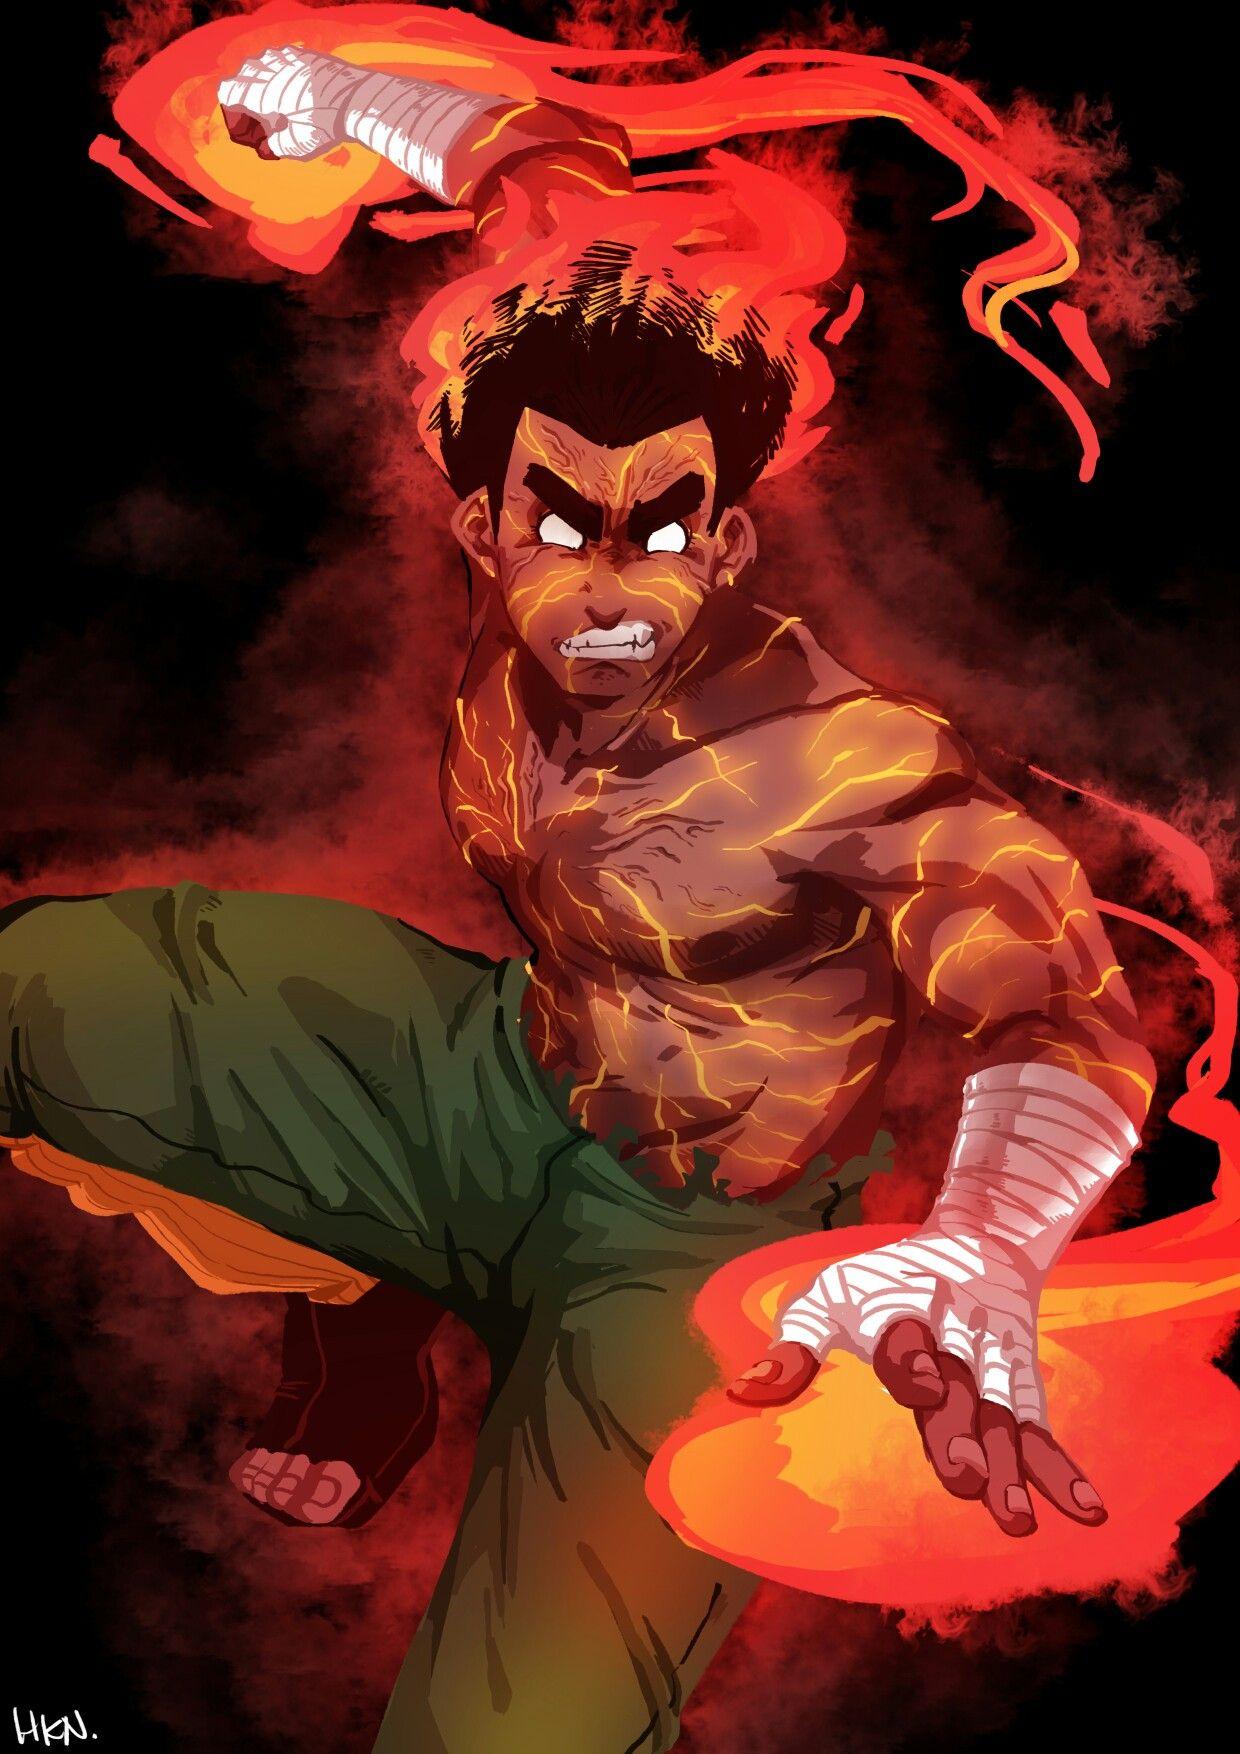 Rock Lee Personagens de anime, Naruto mangá, Anime